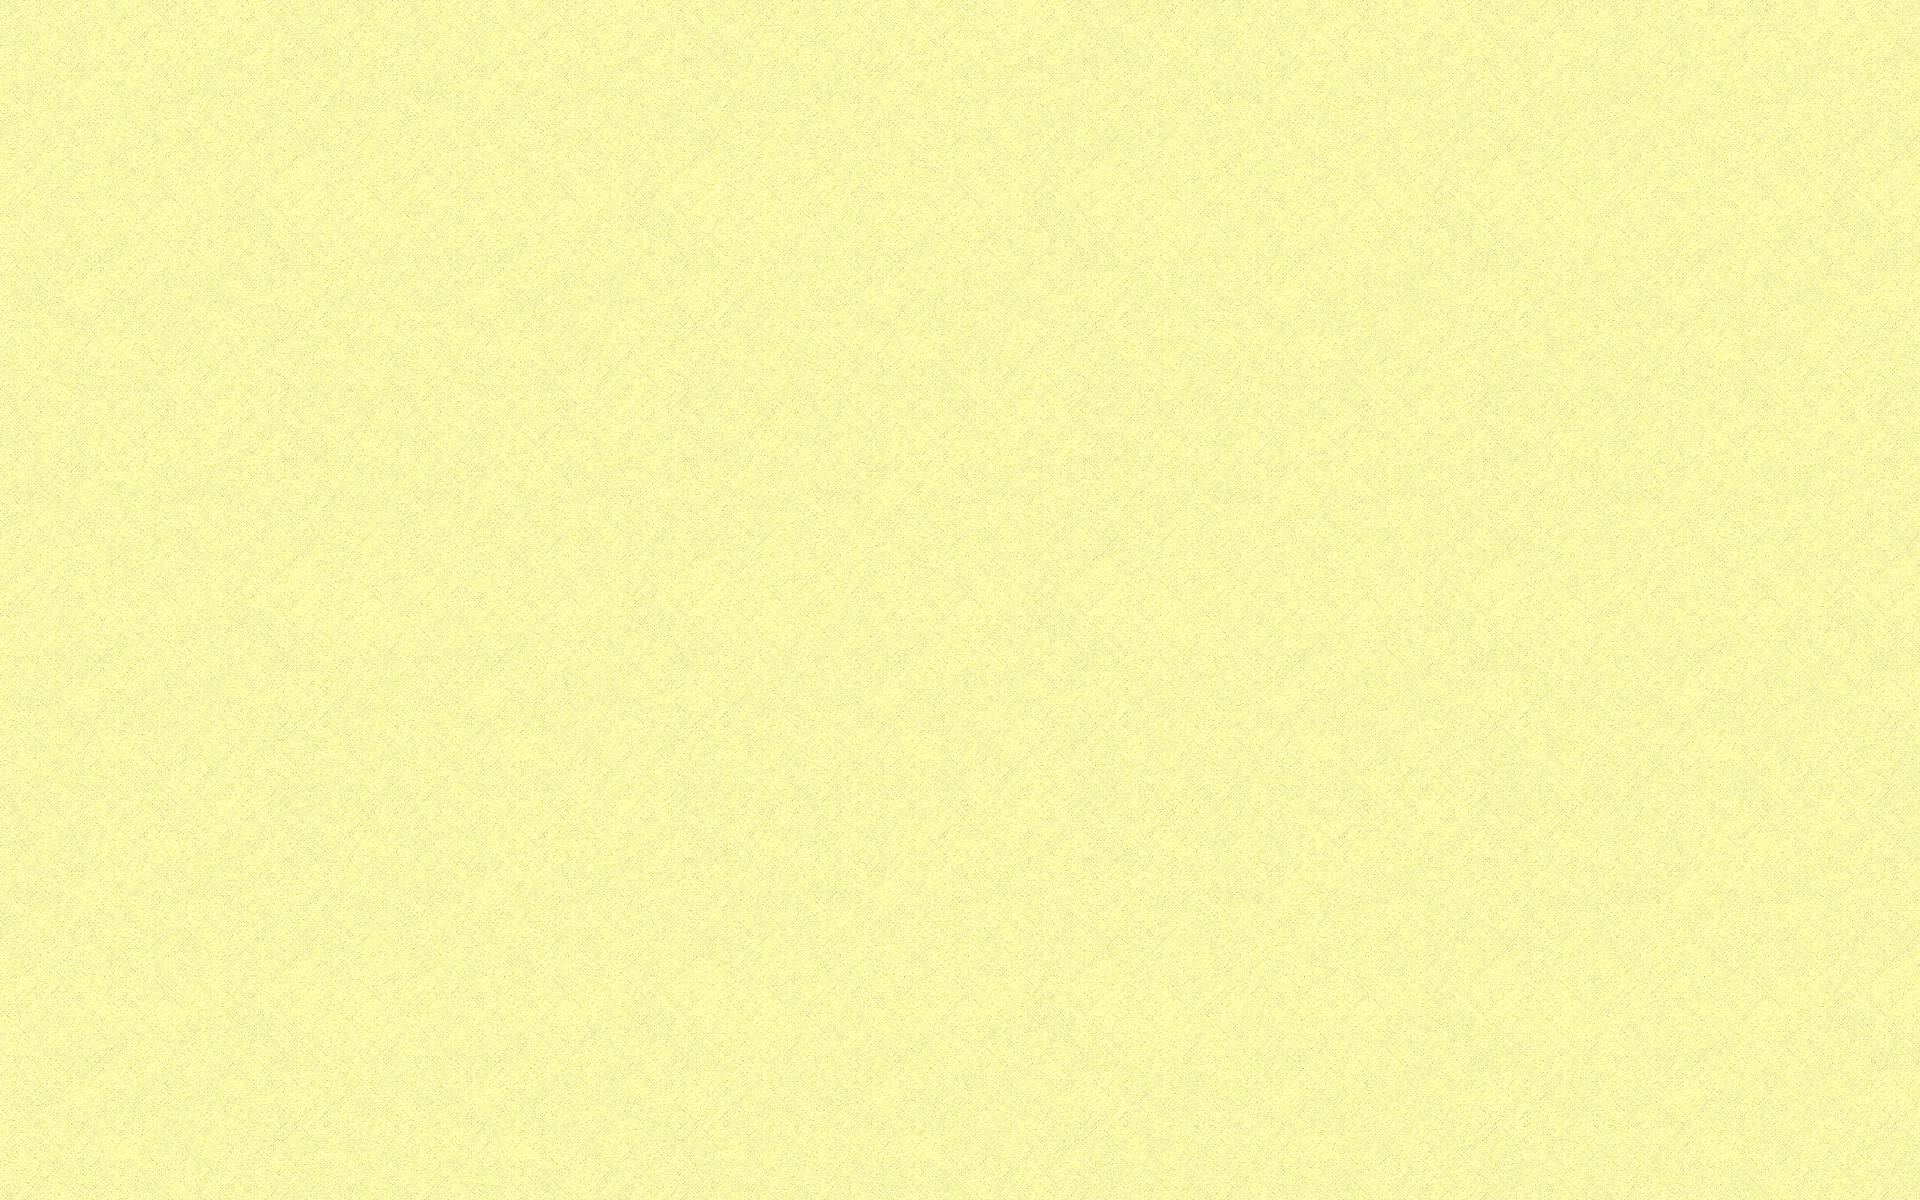 Pale Background - WallpaperSafari